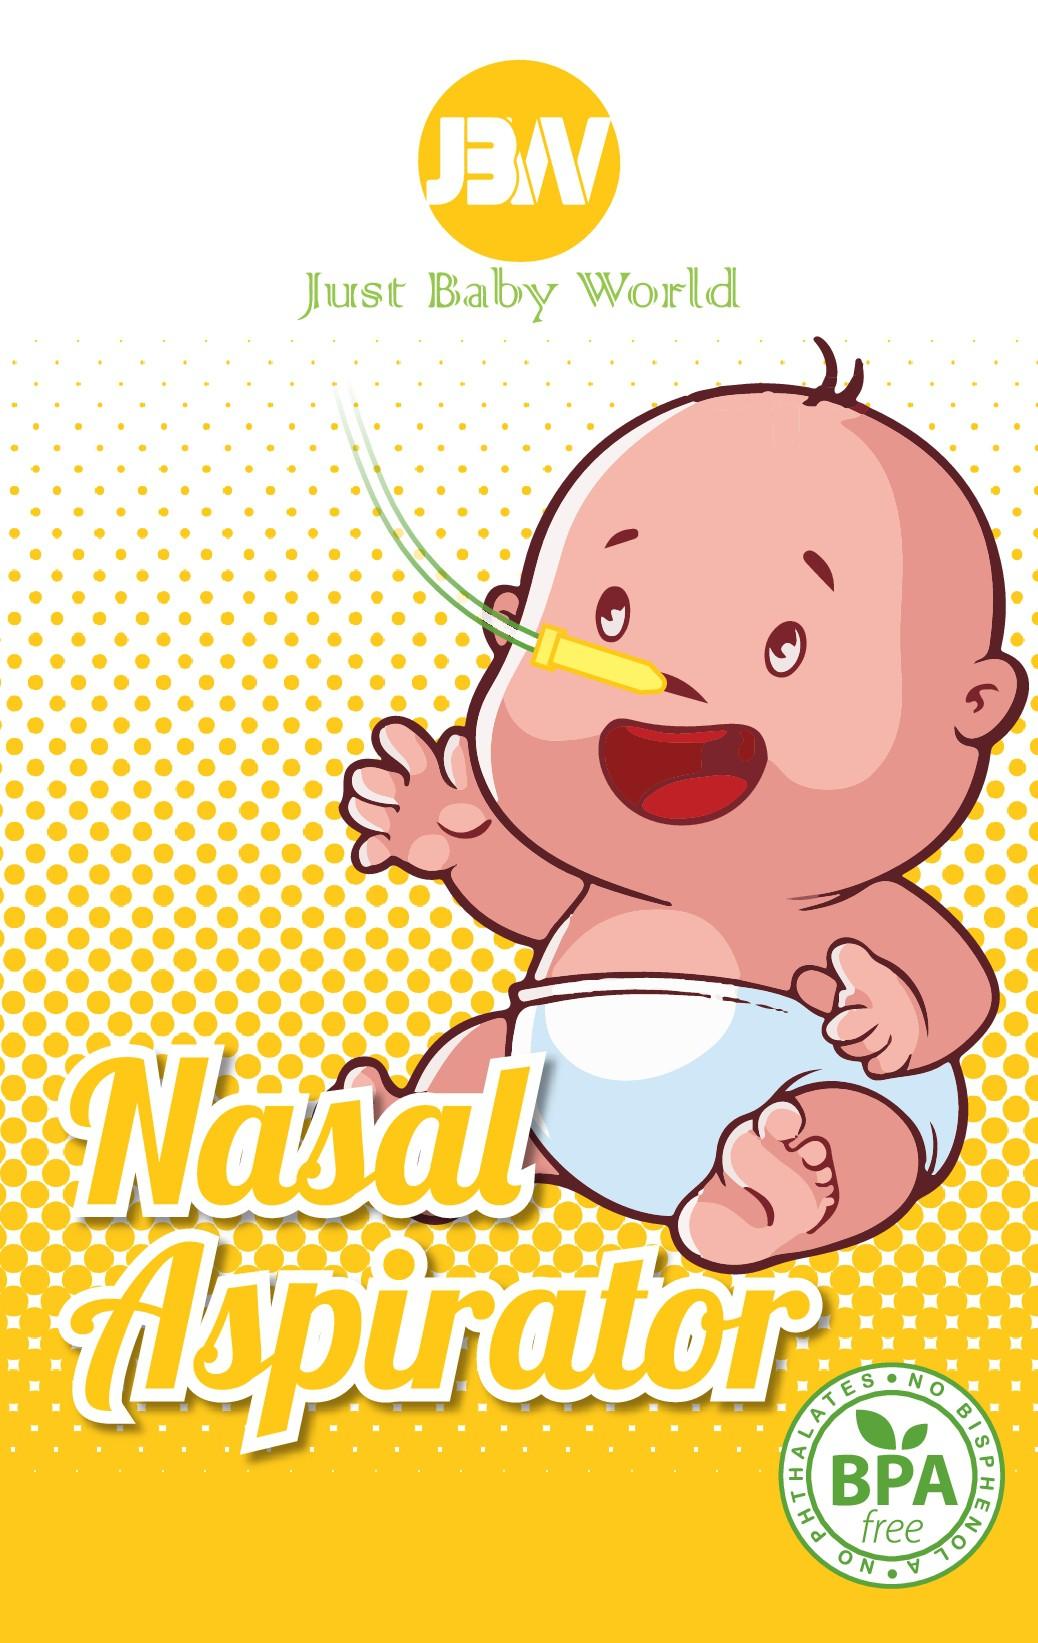 Baby Nasal Aspirator Design